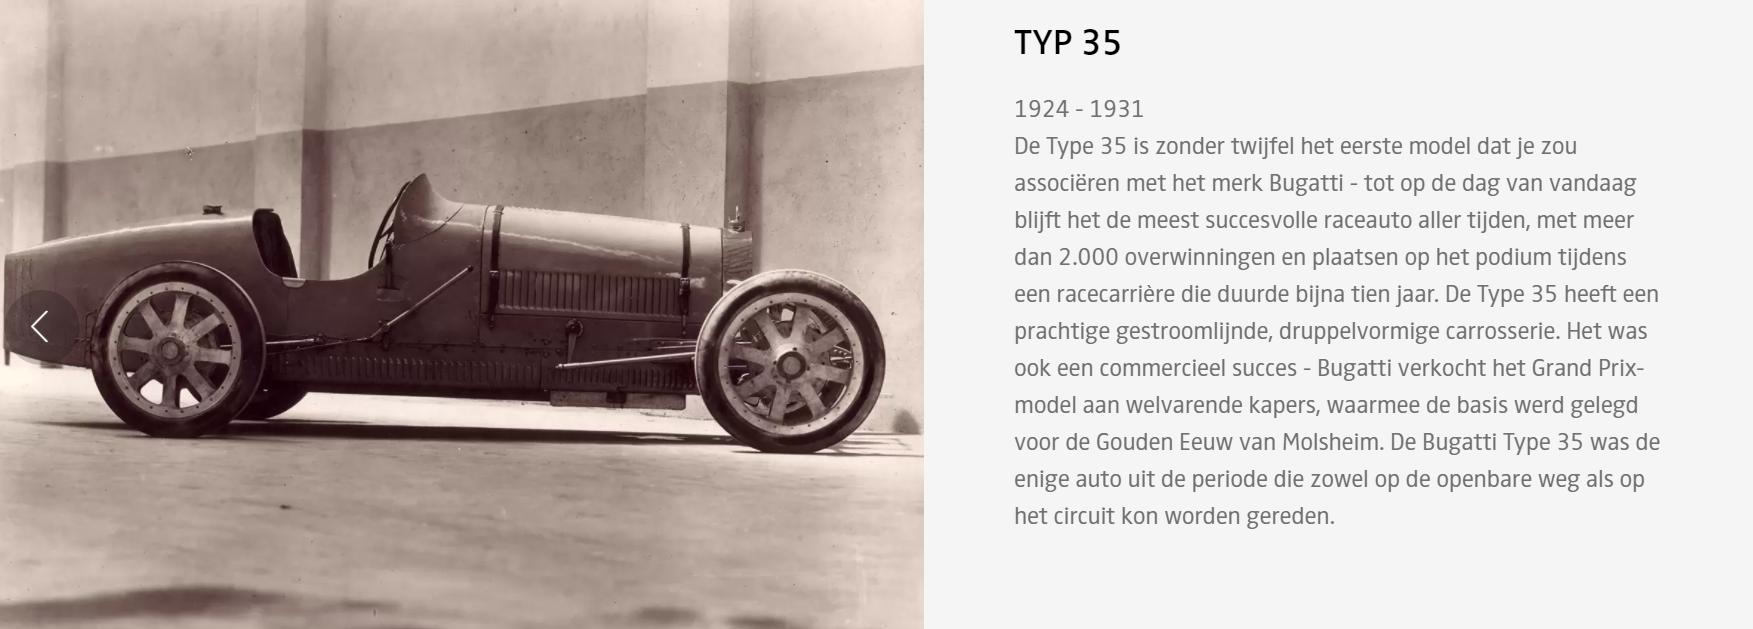 0-Bugatti-Type-35-1924-1931